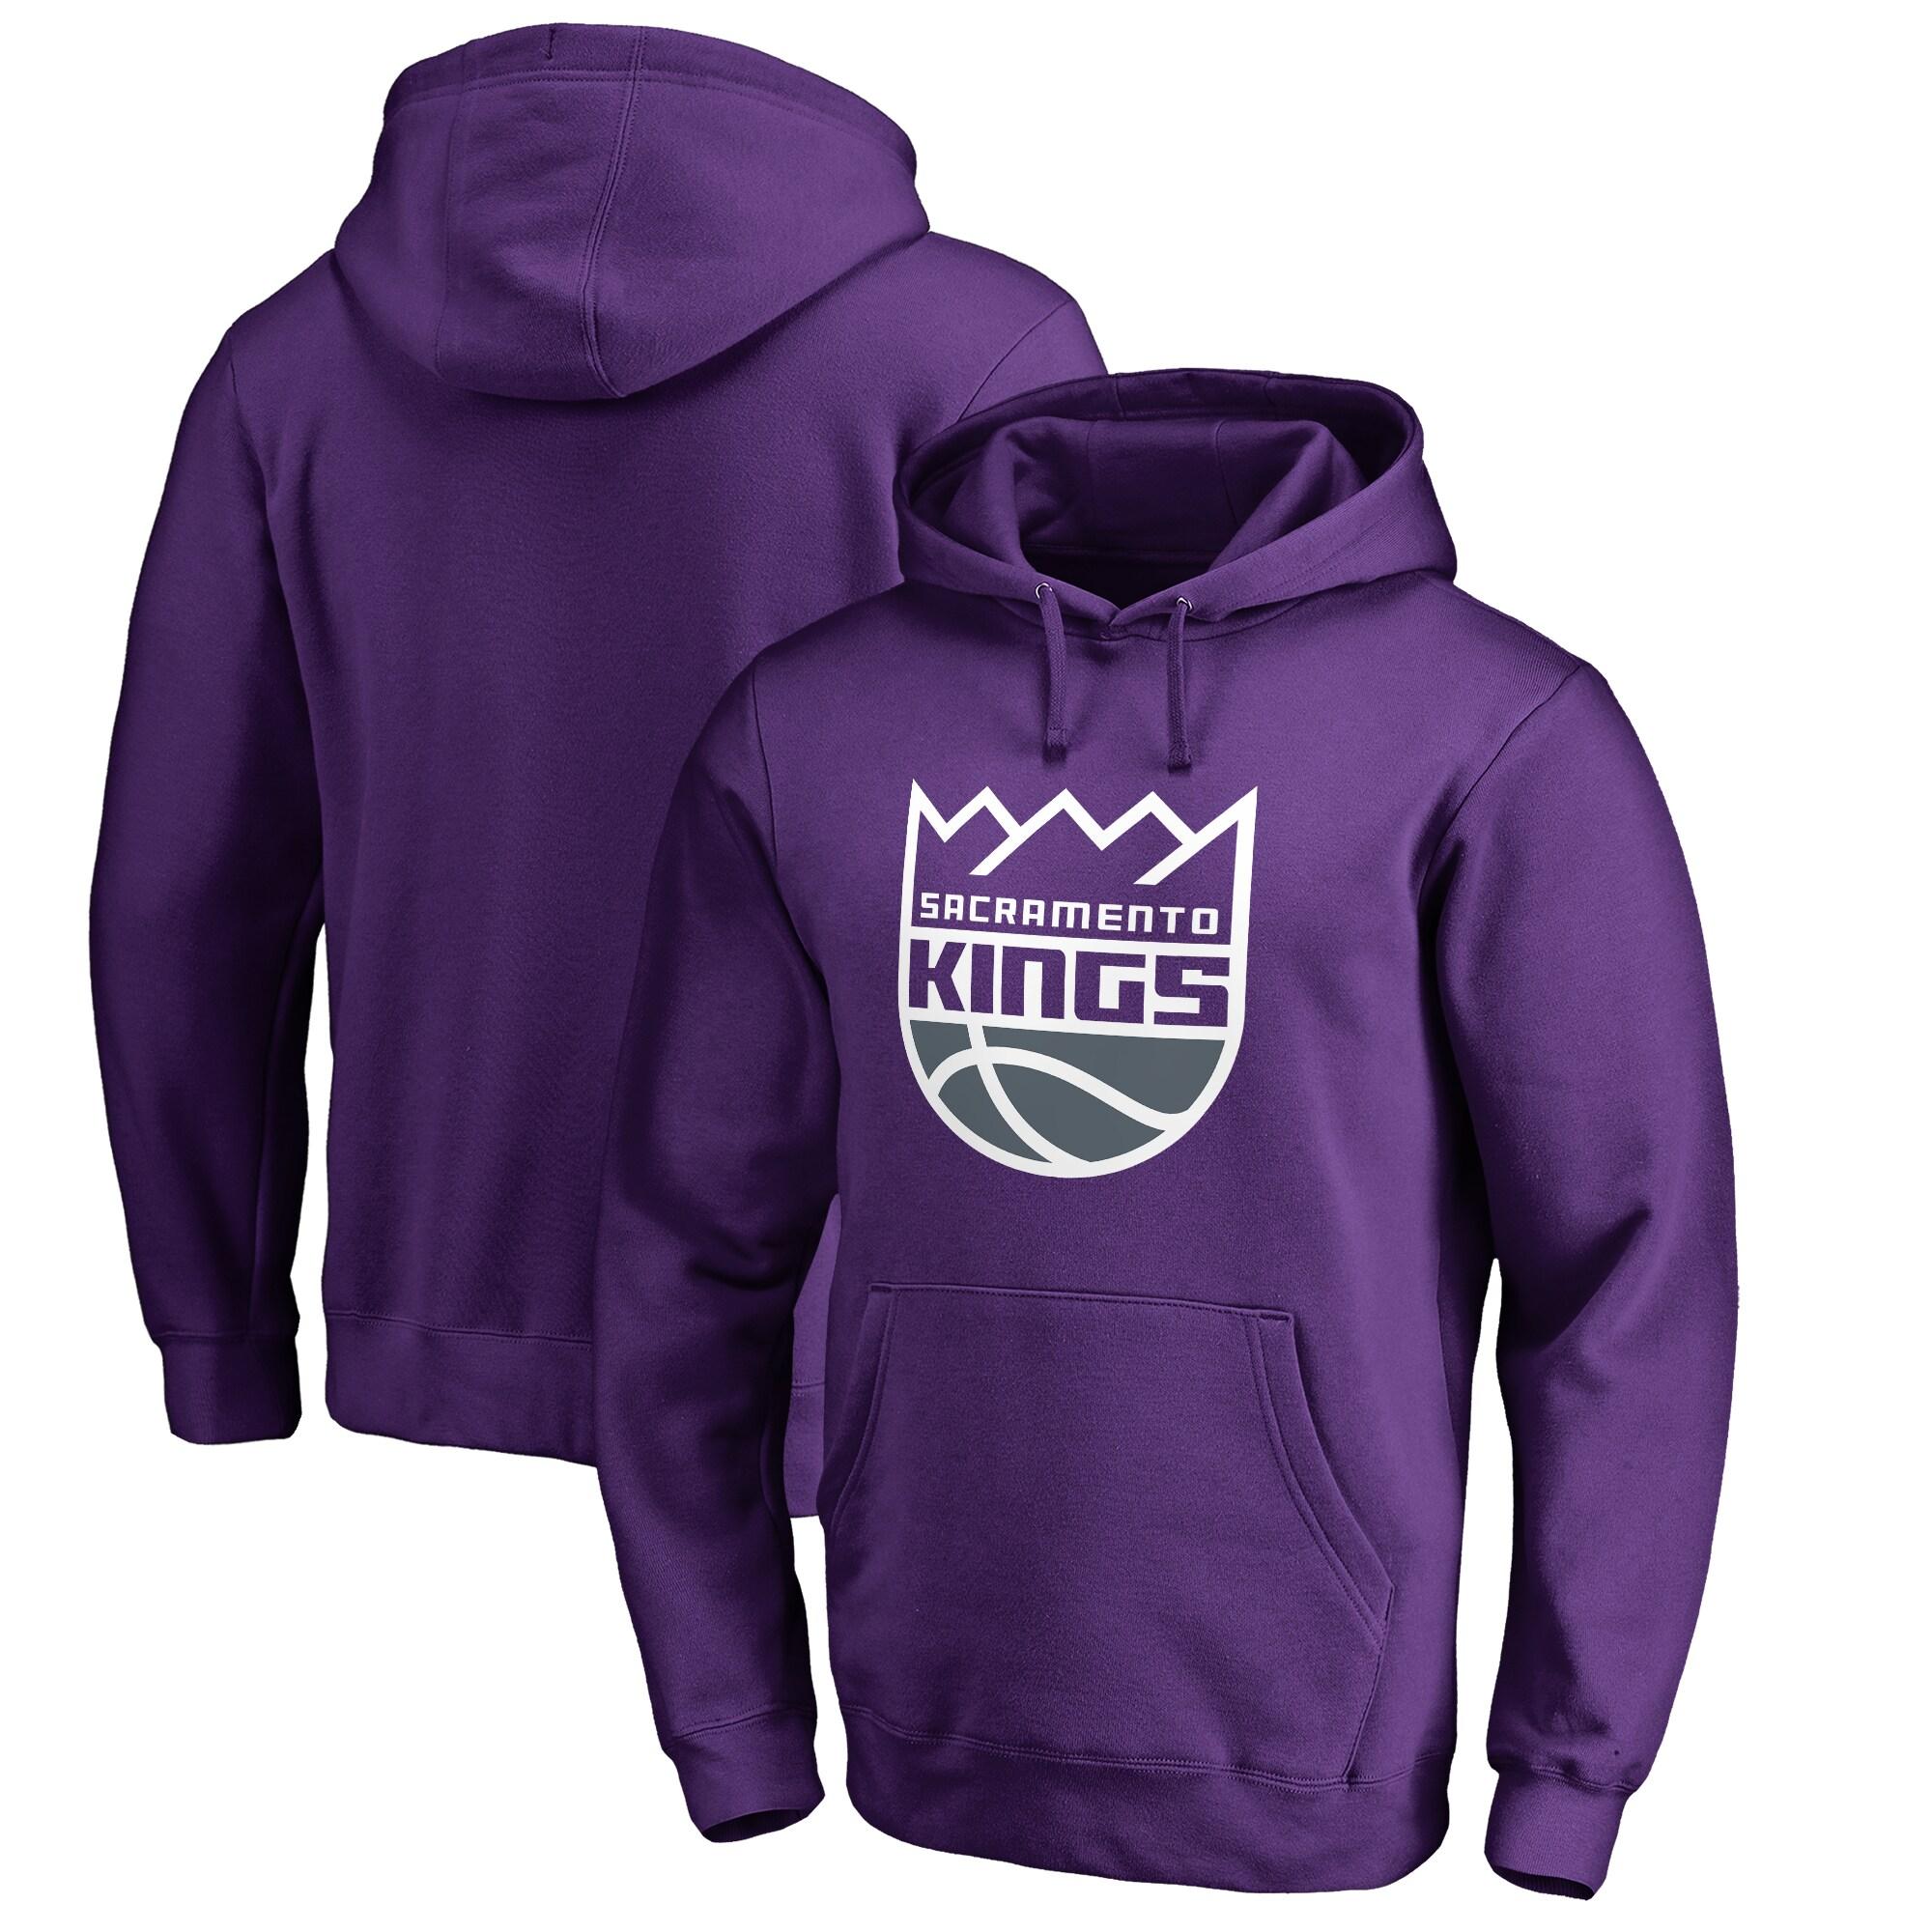 Sacramento Kings Primary Logo Pullover Hoodie - Purple